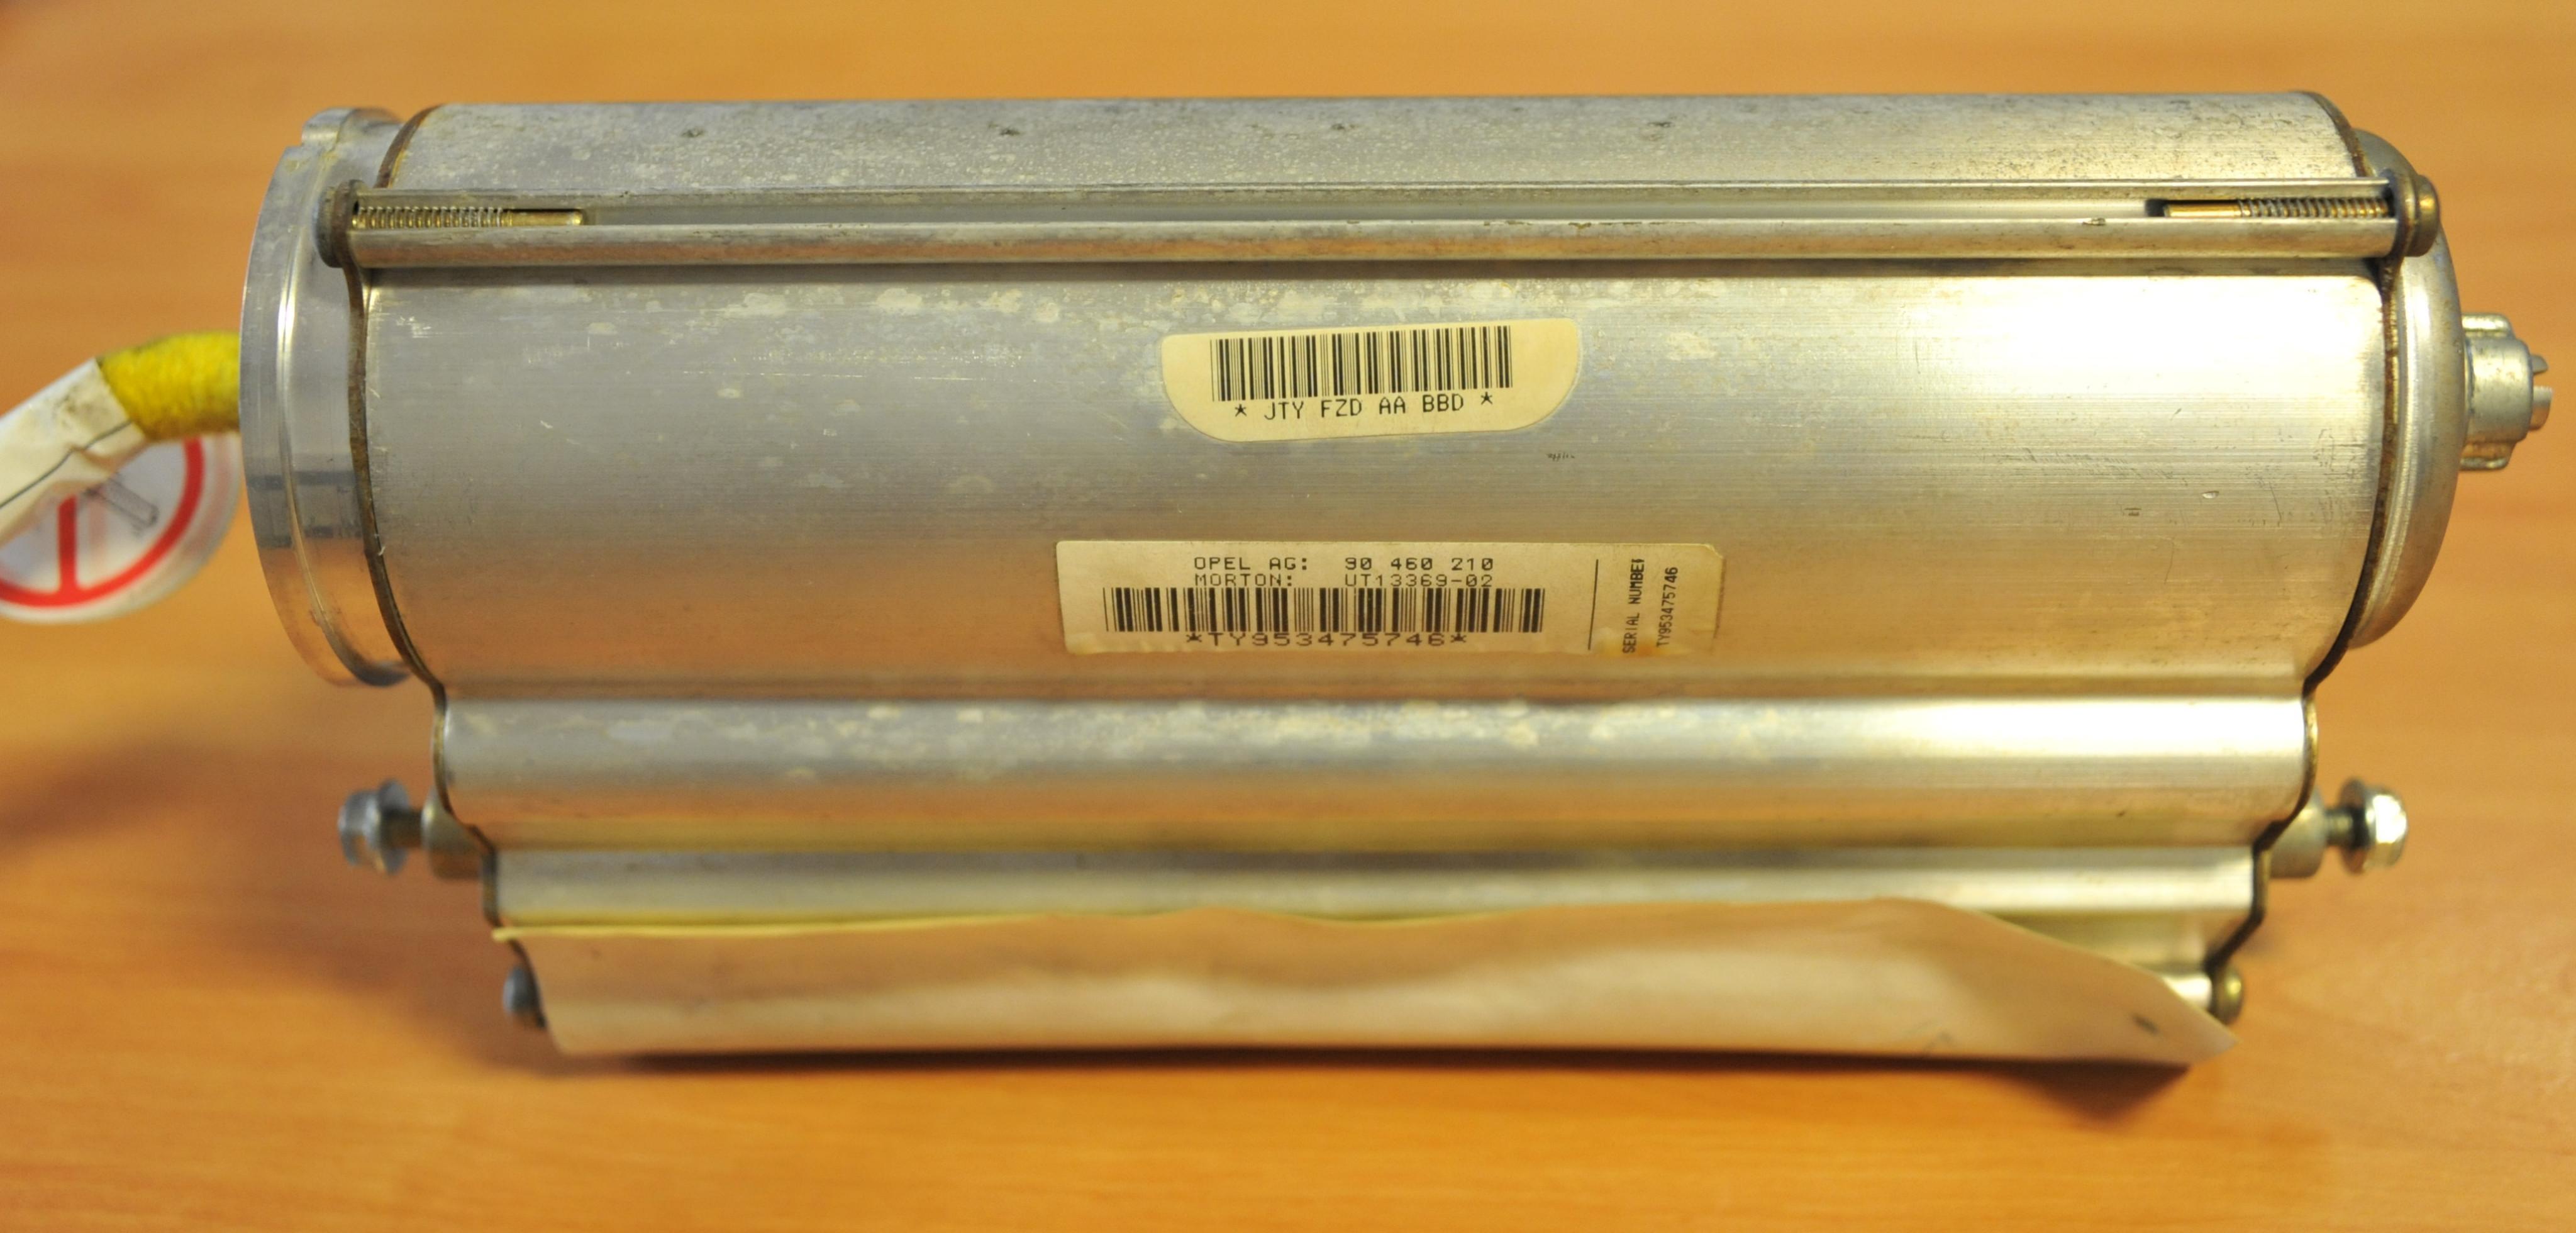 90460210, Air bag assembly GM part